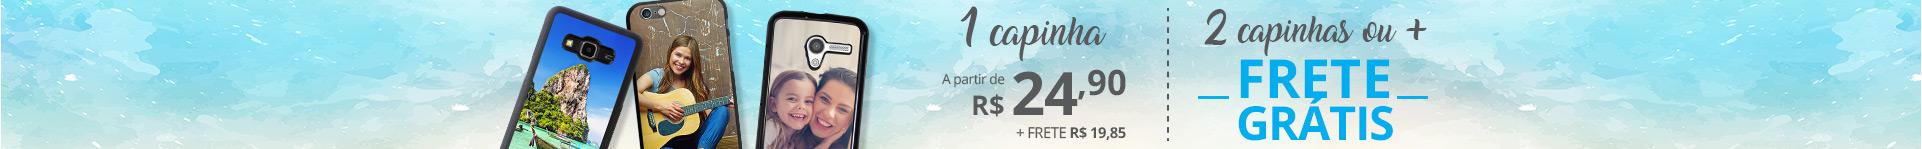 PH_Landing_capinha_frete_gratis_PRODUTO_BANNER_150